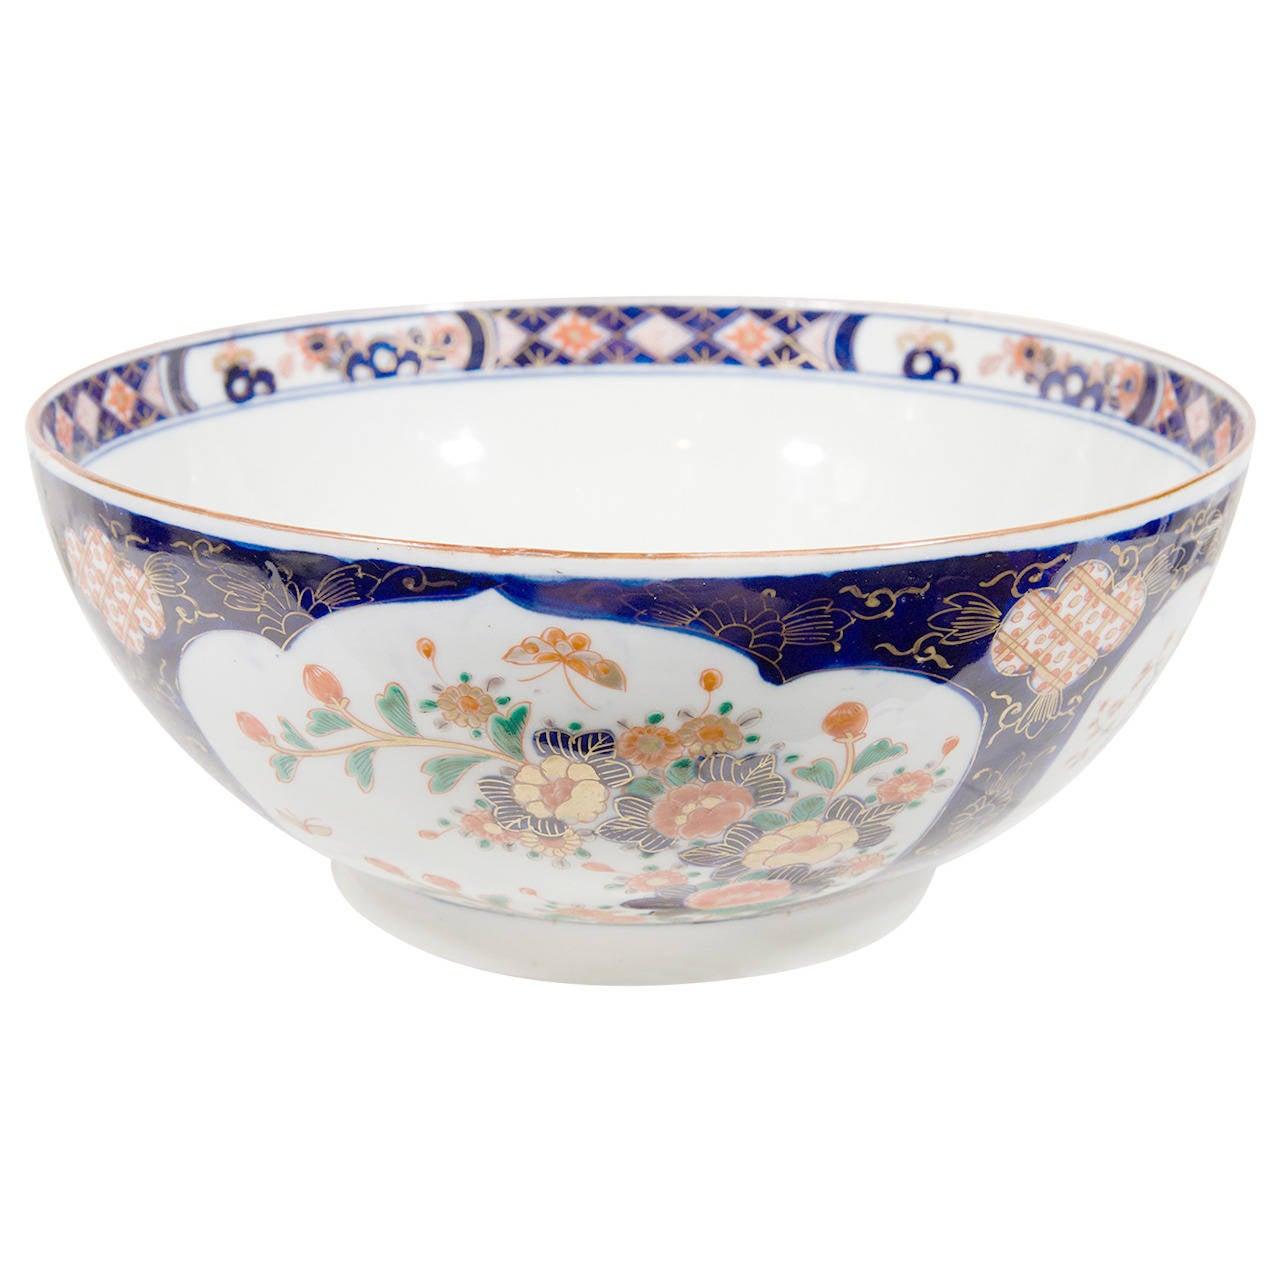 Antique Imari Porcelain Punch Bowl at 1stdibs